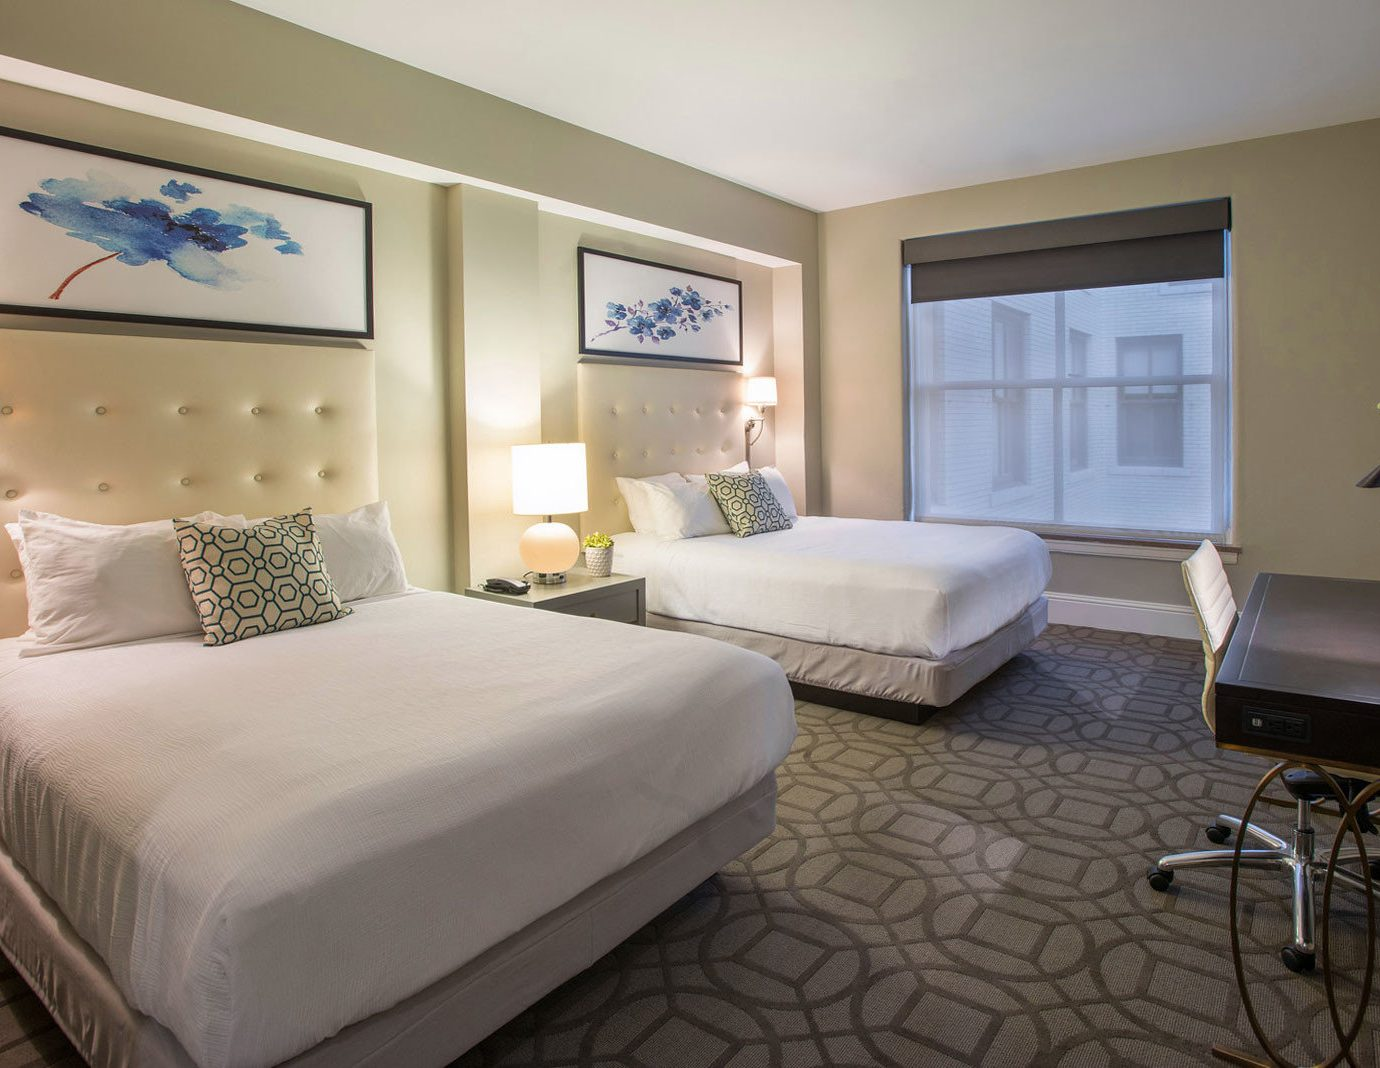 Bedroom Business property Suite condominium cottage living room